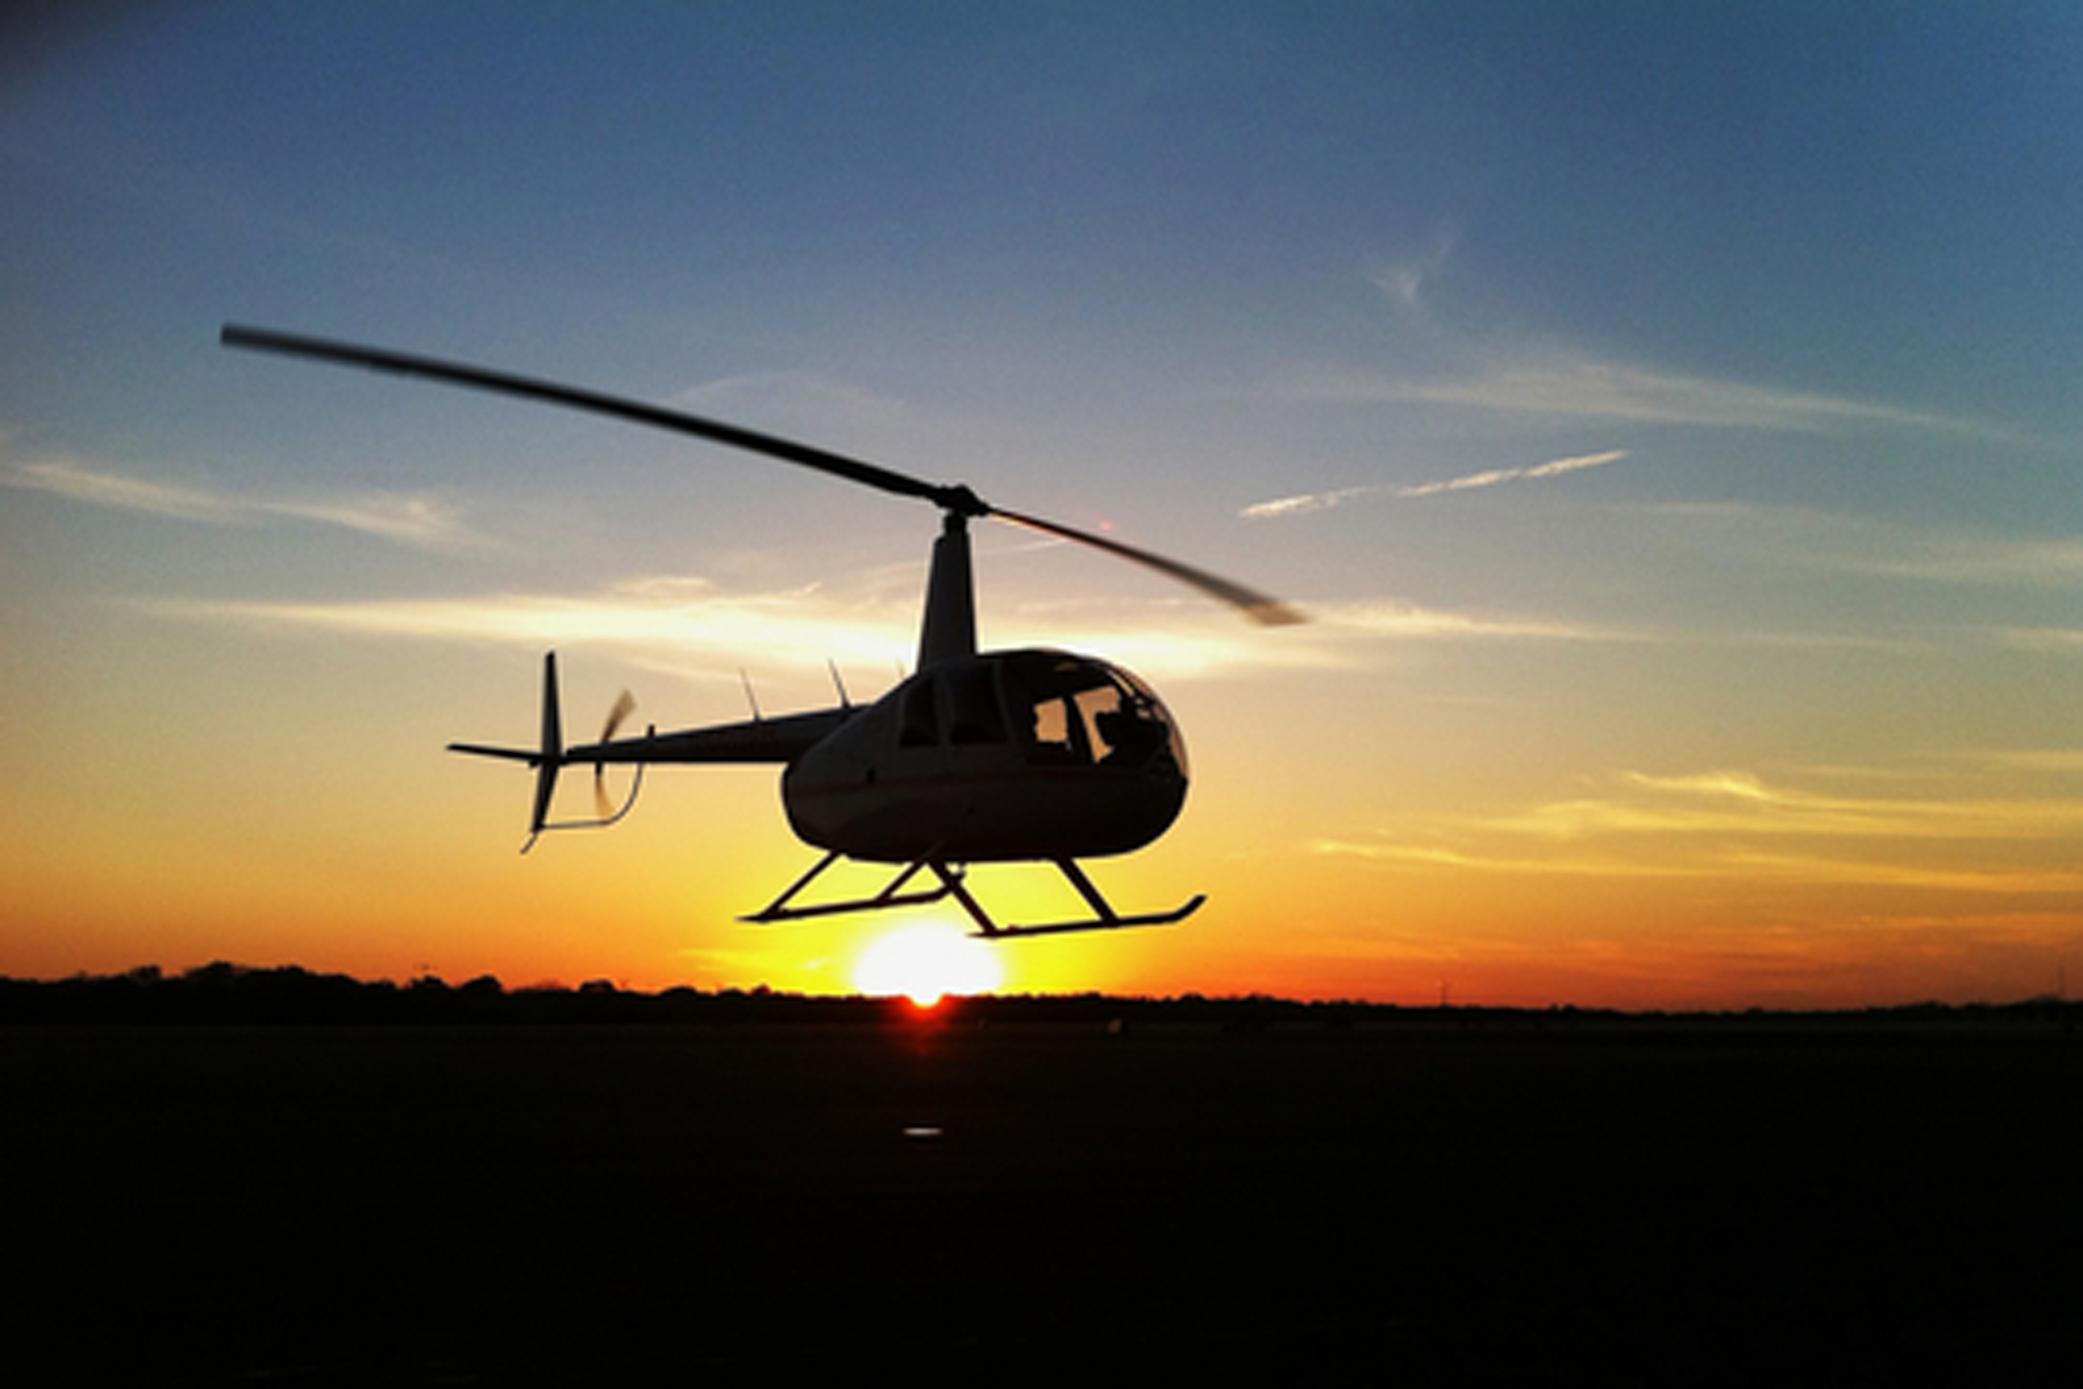 SunsetCelebration.jpg